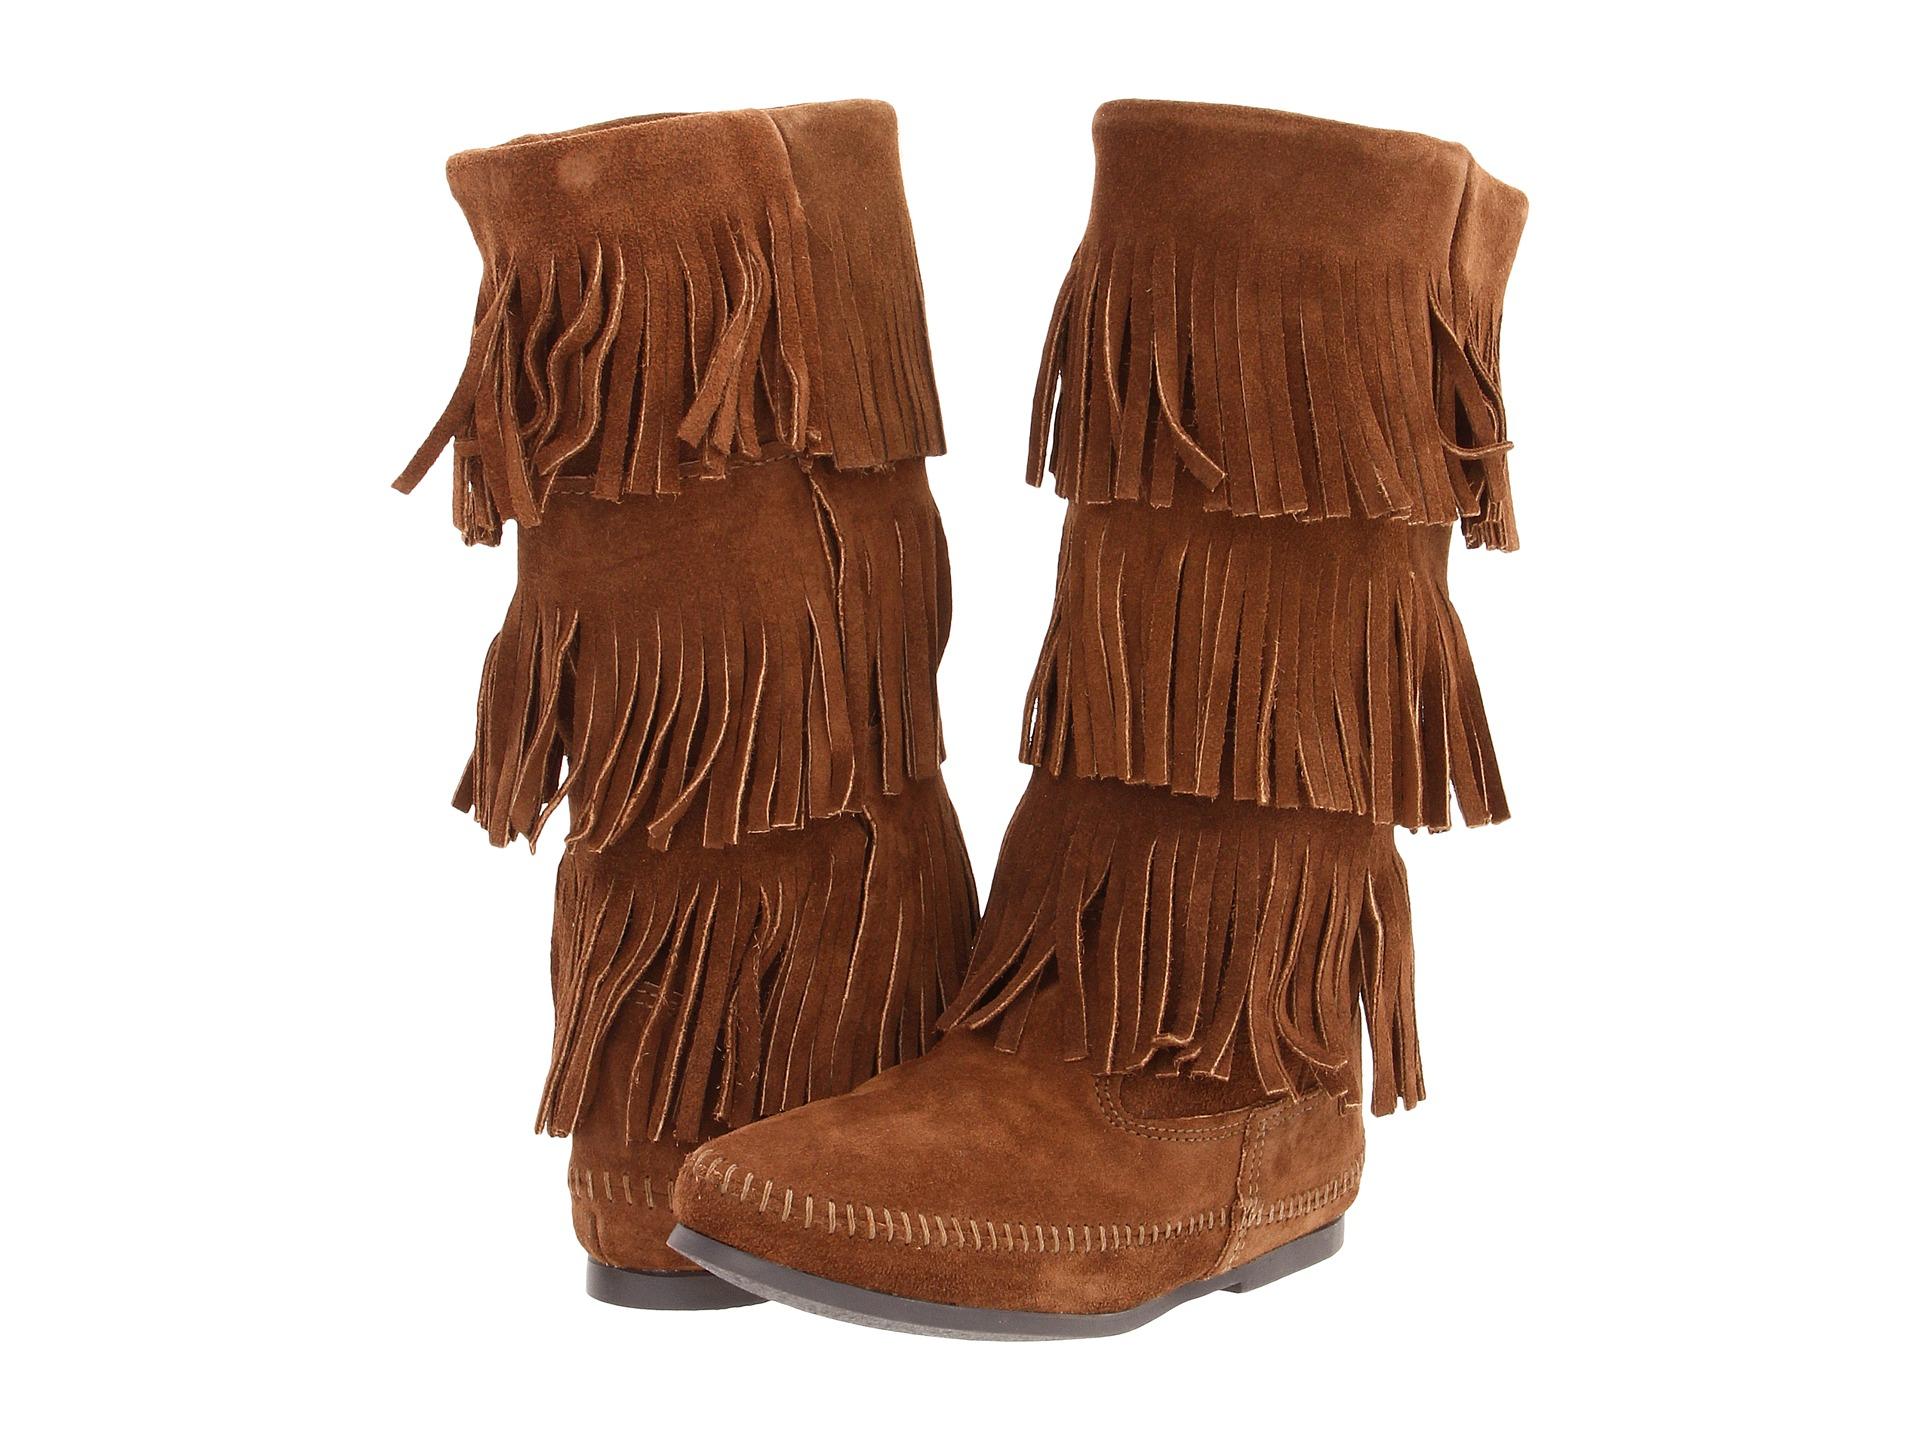 fringe boots for cheapMinnetonka Calf Hi 3 Layer Fringe Boot   Zapposcom Free Shipping 7mTzCwuO